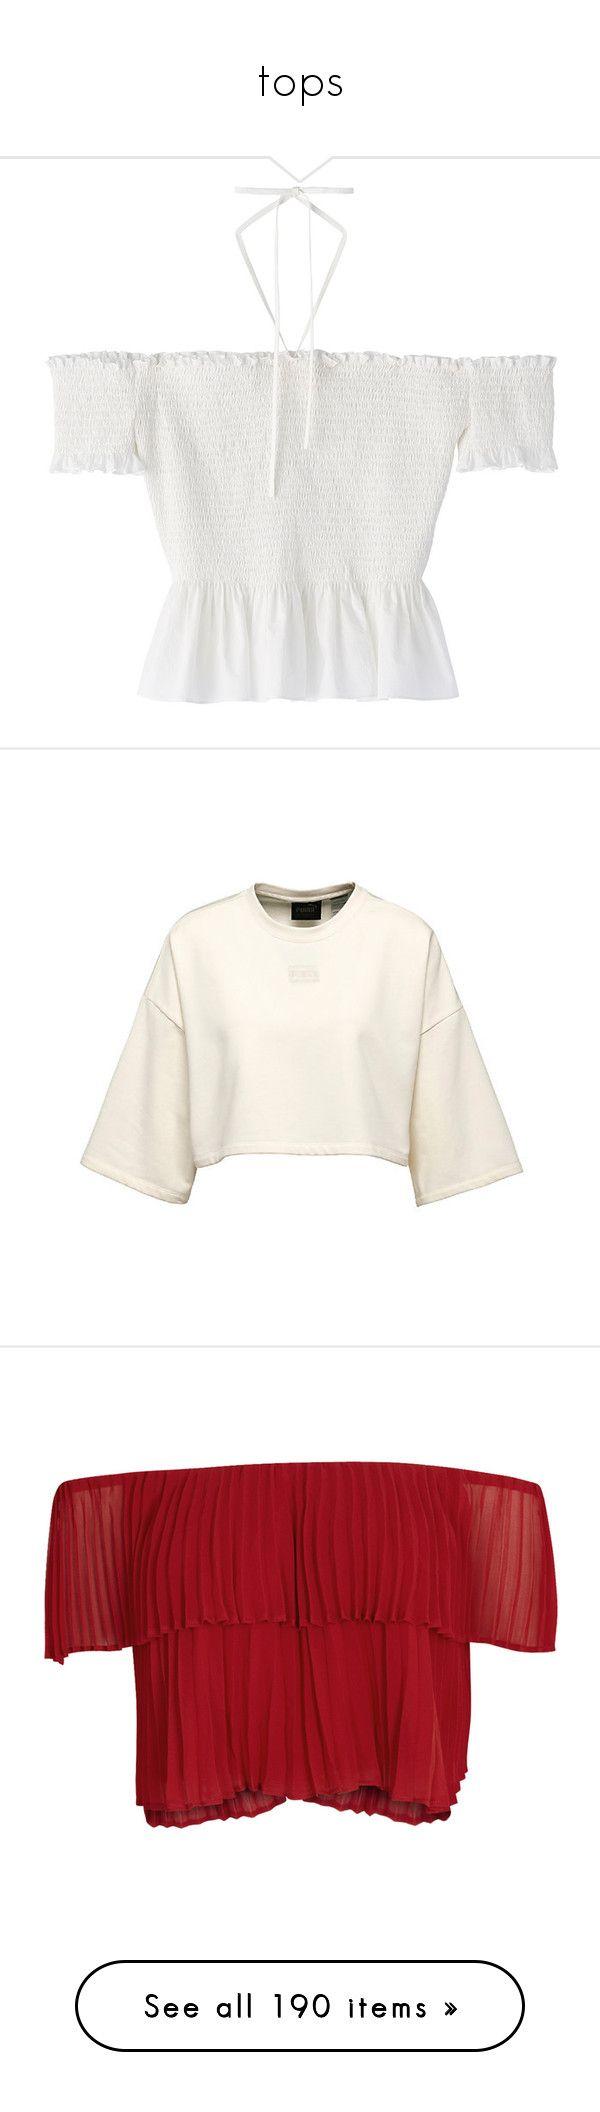 """tops"" by mihai-theodora ❤ liked on Polyvore featuring tops, t-shirts, crop top, shirts, blusa, grey, gray t shirt, cotton t shirts, gray shirt and puma t shirts"